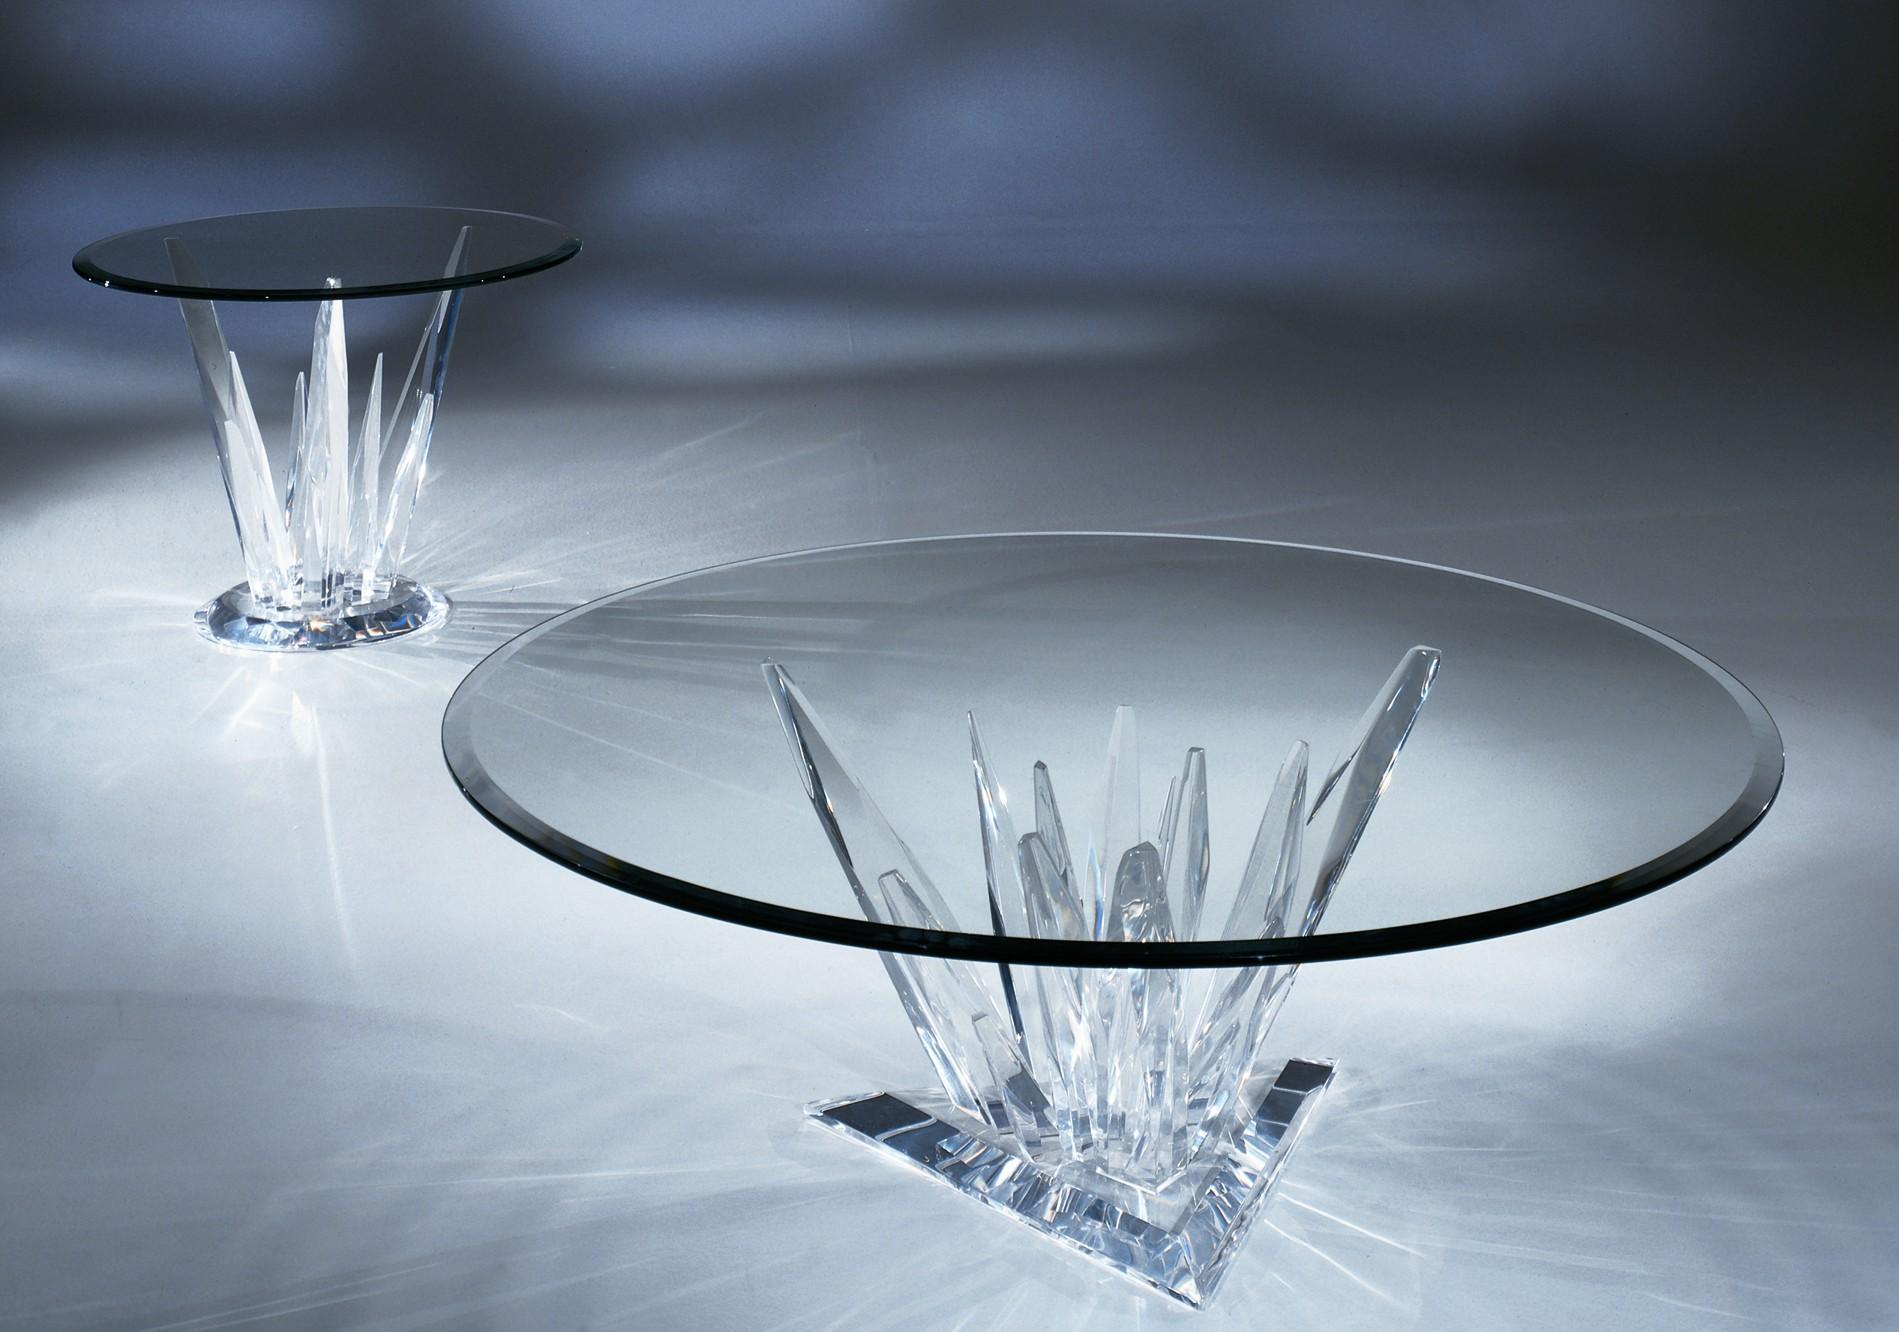 Crystals Coffee Table, Acrylic Coffee Tables, Acrylic ...